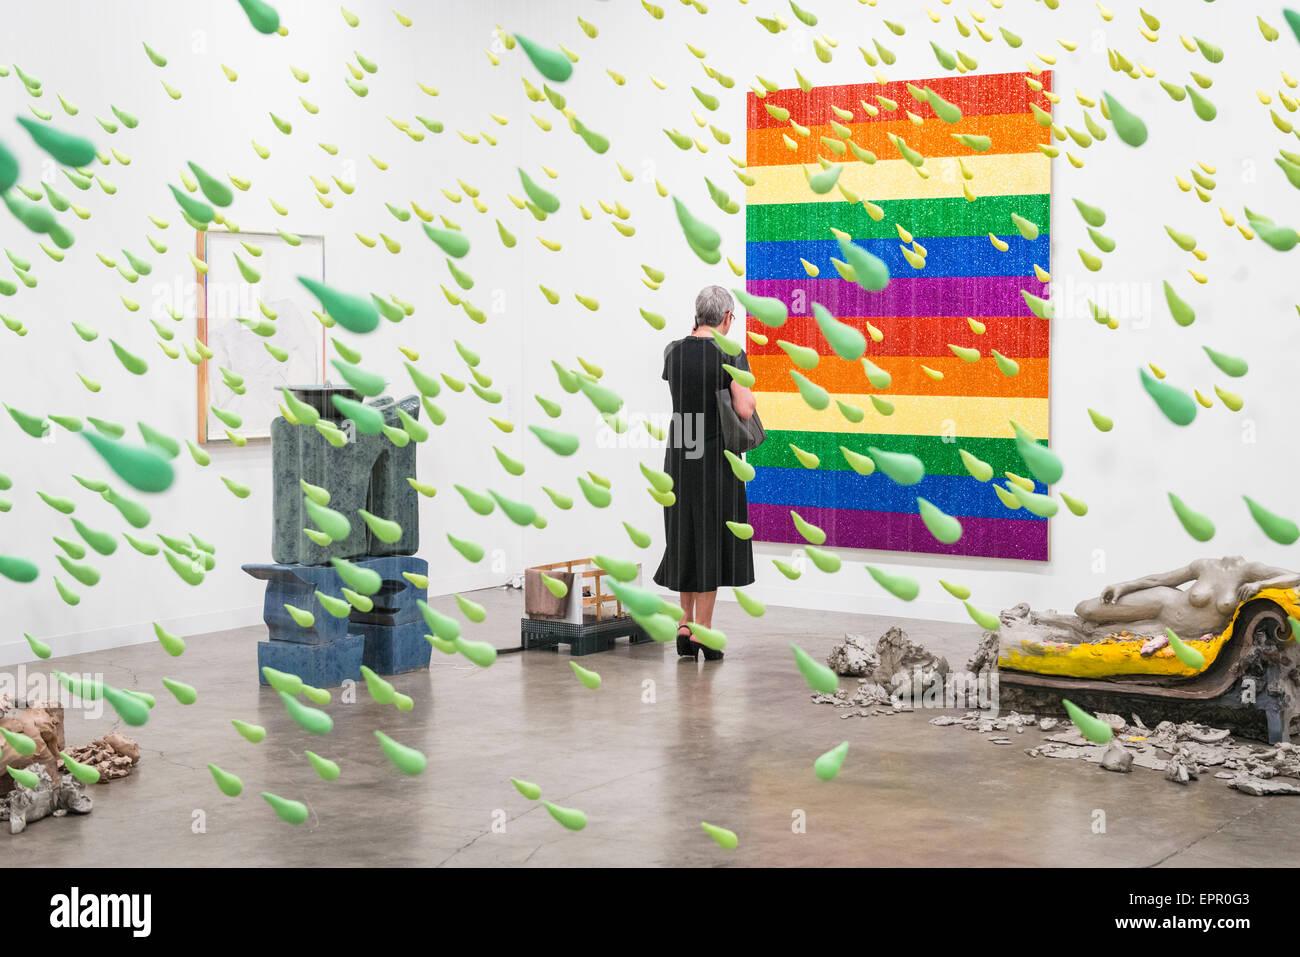 Florida Miami Art Basel international fair exhibition modern contemporary painting pictures sculptures green raindrops Stock Photo